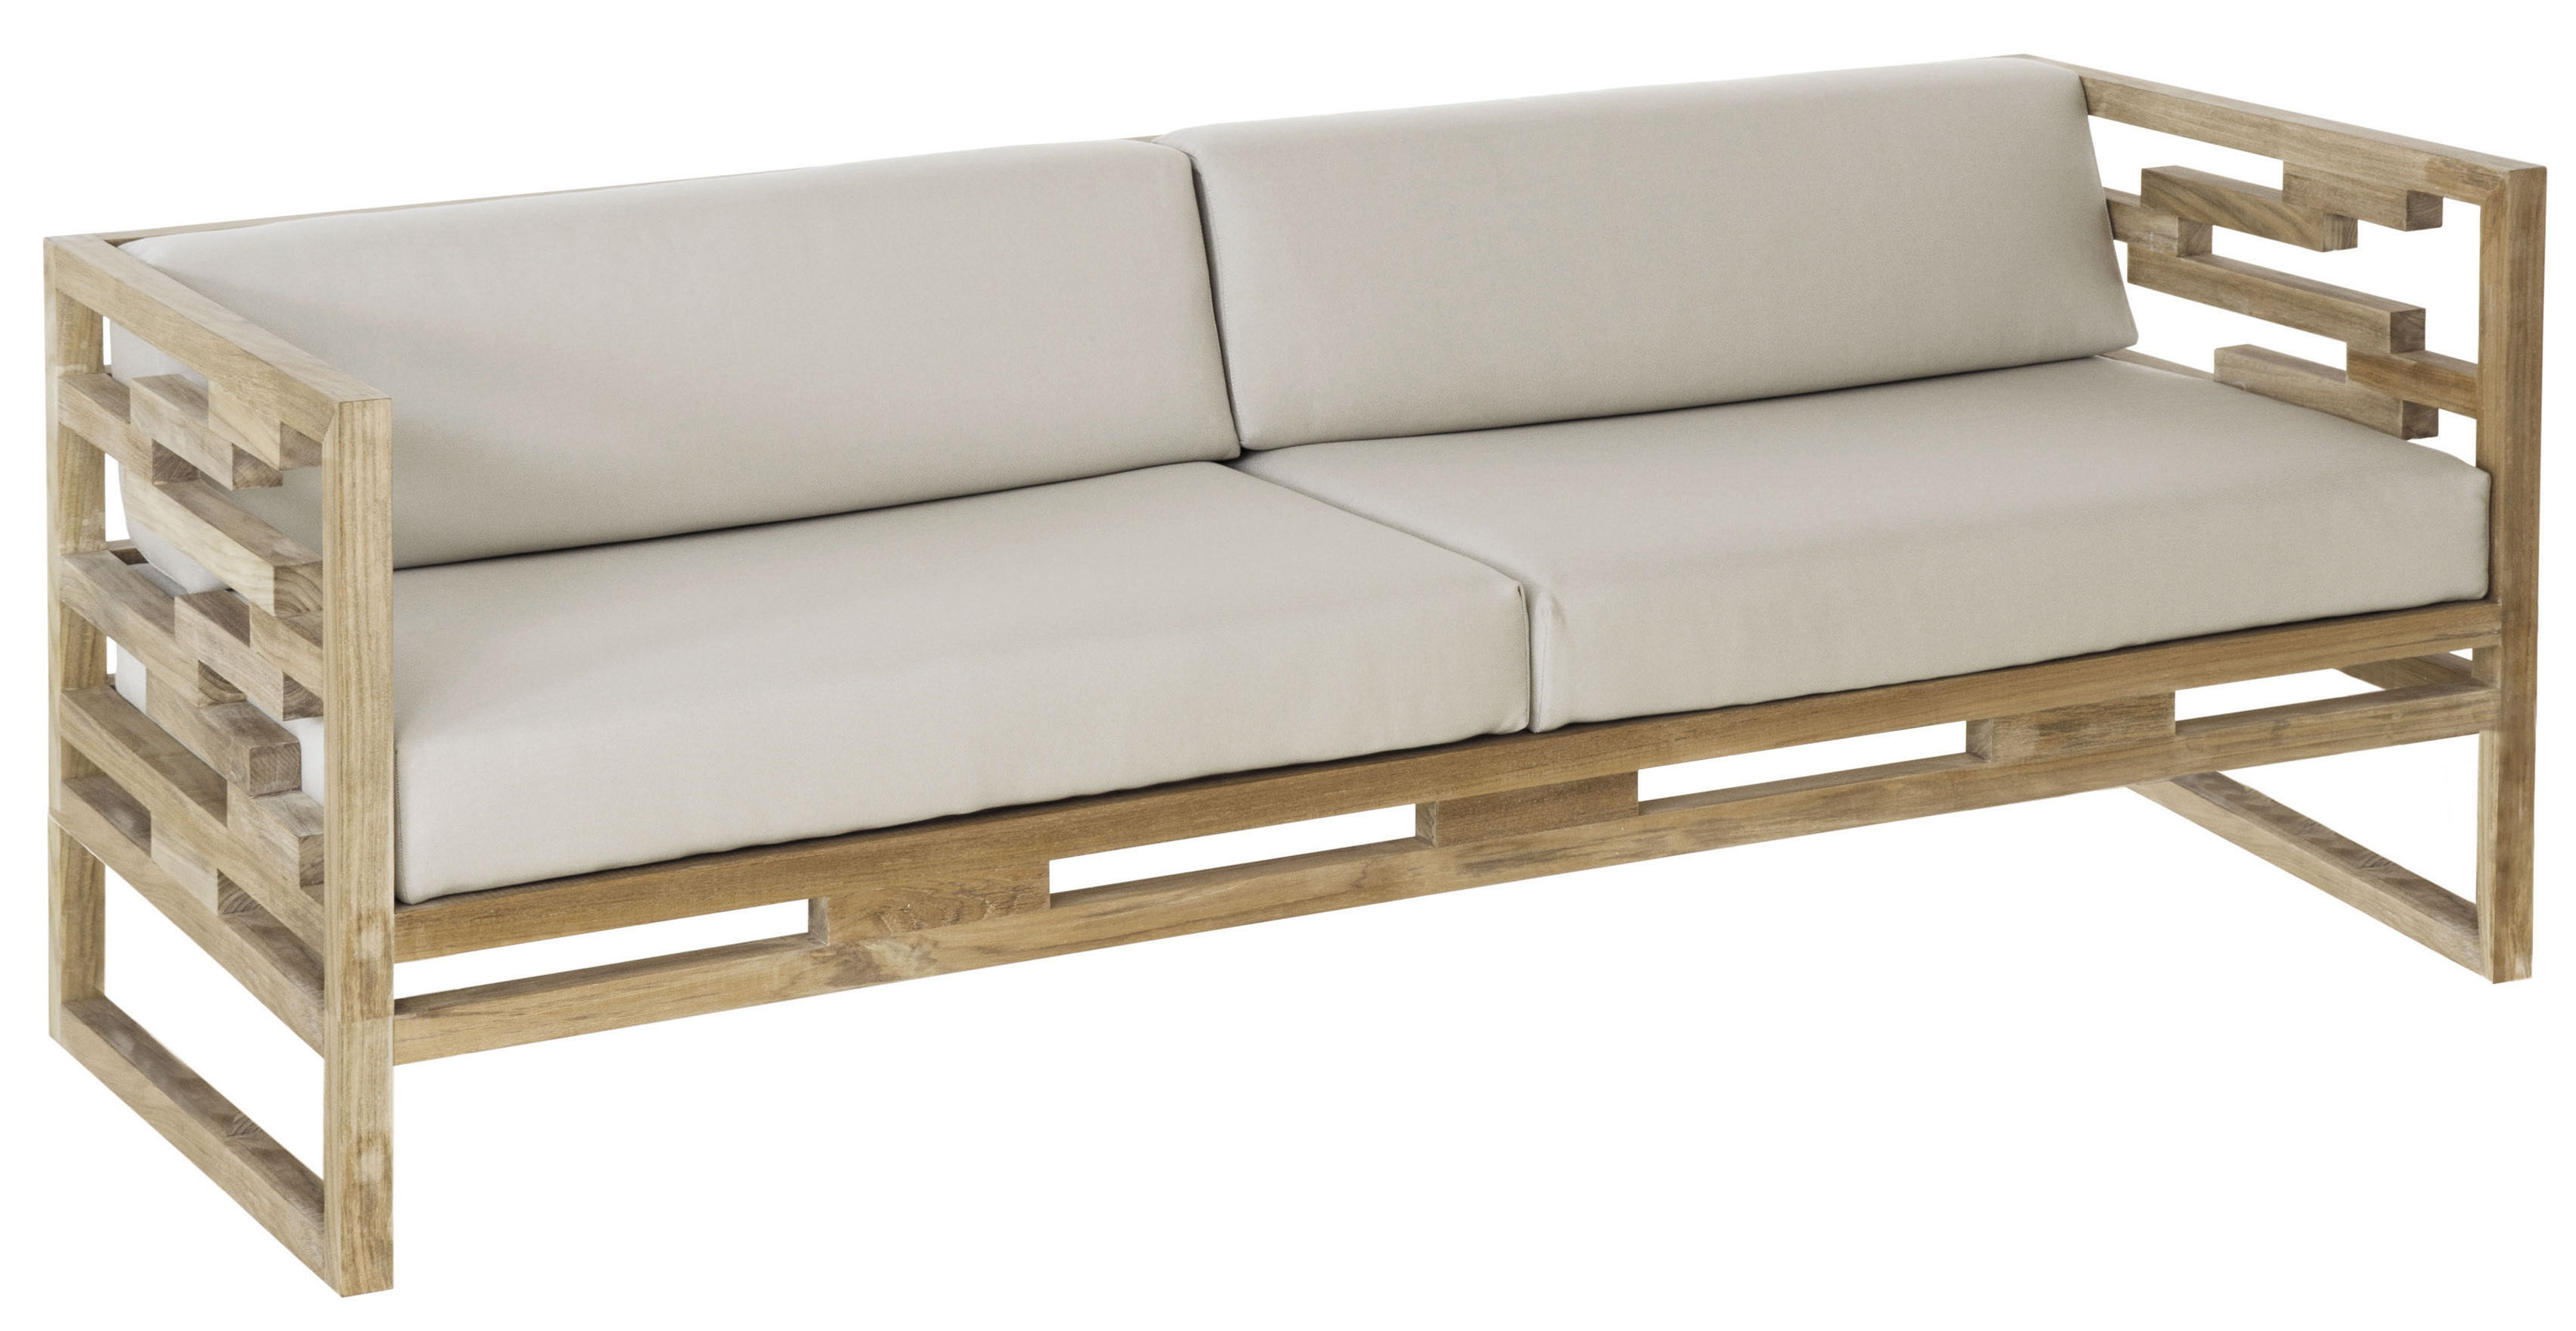 kontiki straight sofa teak l 195 cm teak perla beige cushion by emu. Black Bedroom Furniture Sets. Home Design Ideas